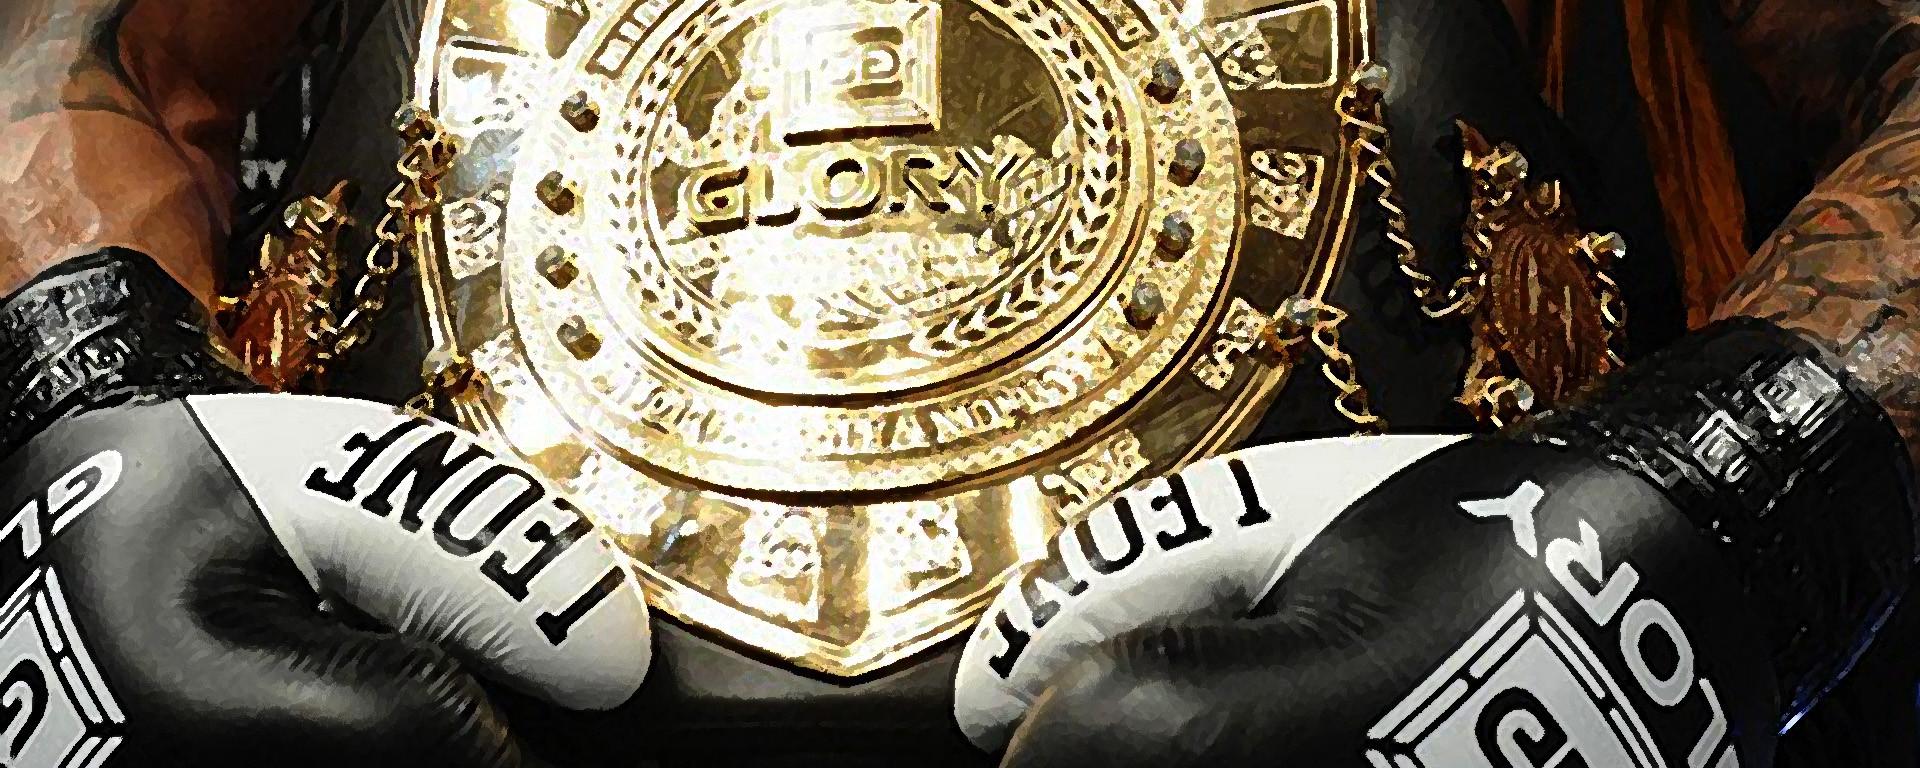 2020_04_sponsor_Glory_belt.jpg